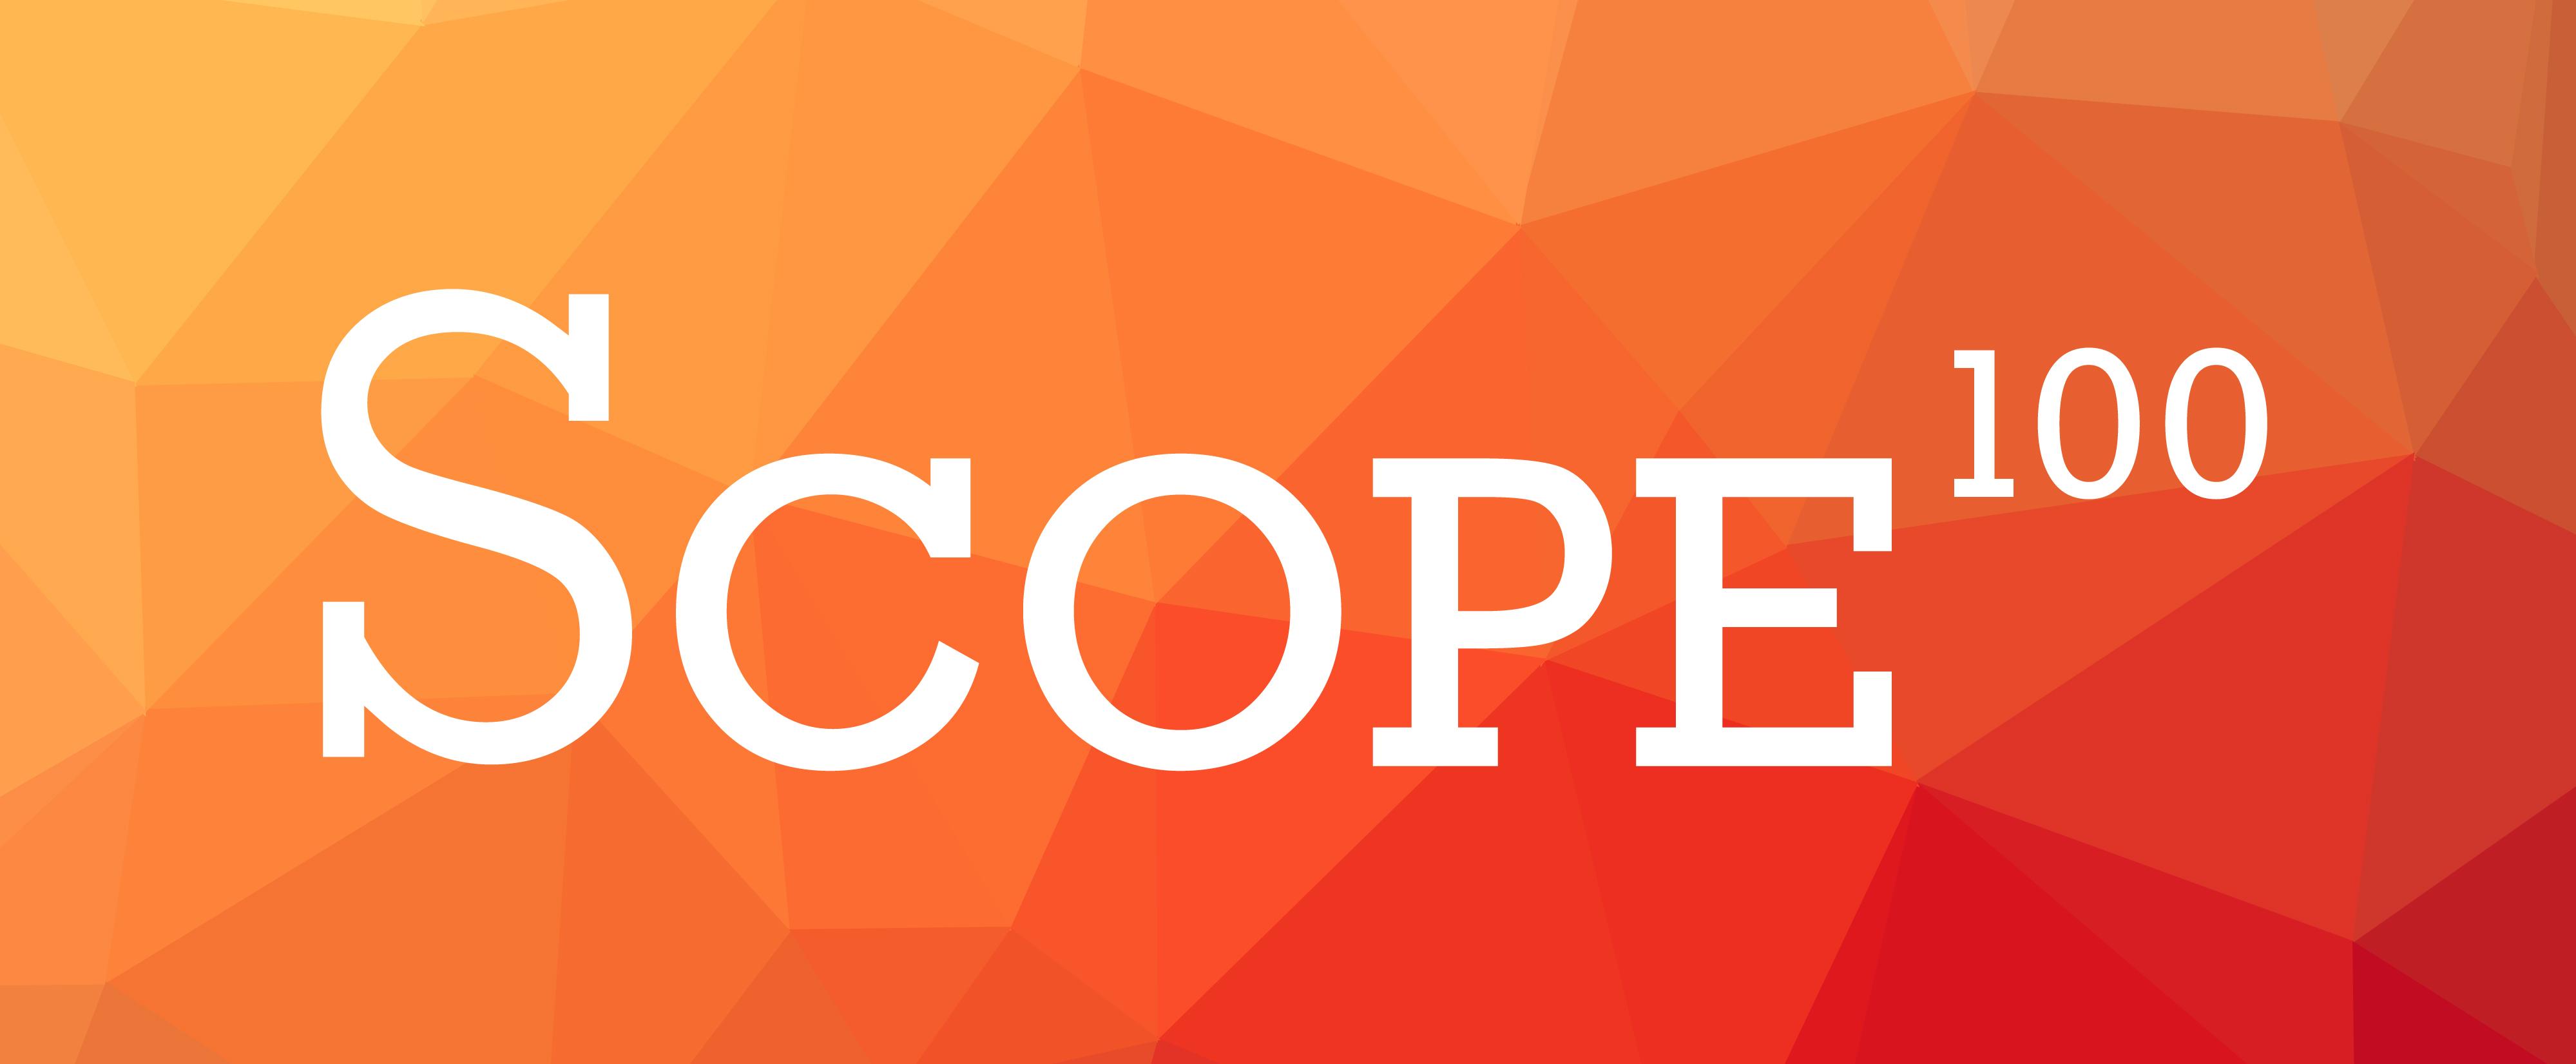 scope100_logo.jpg